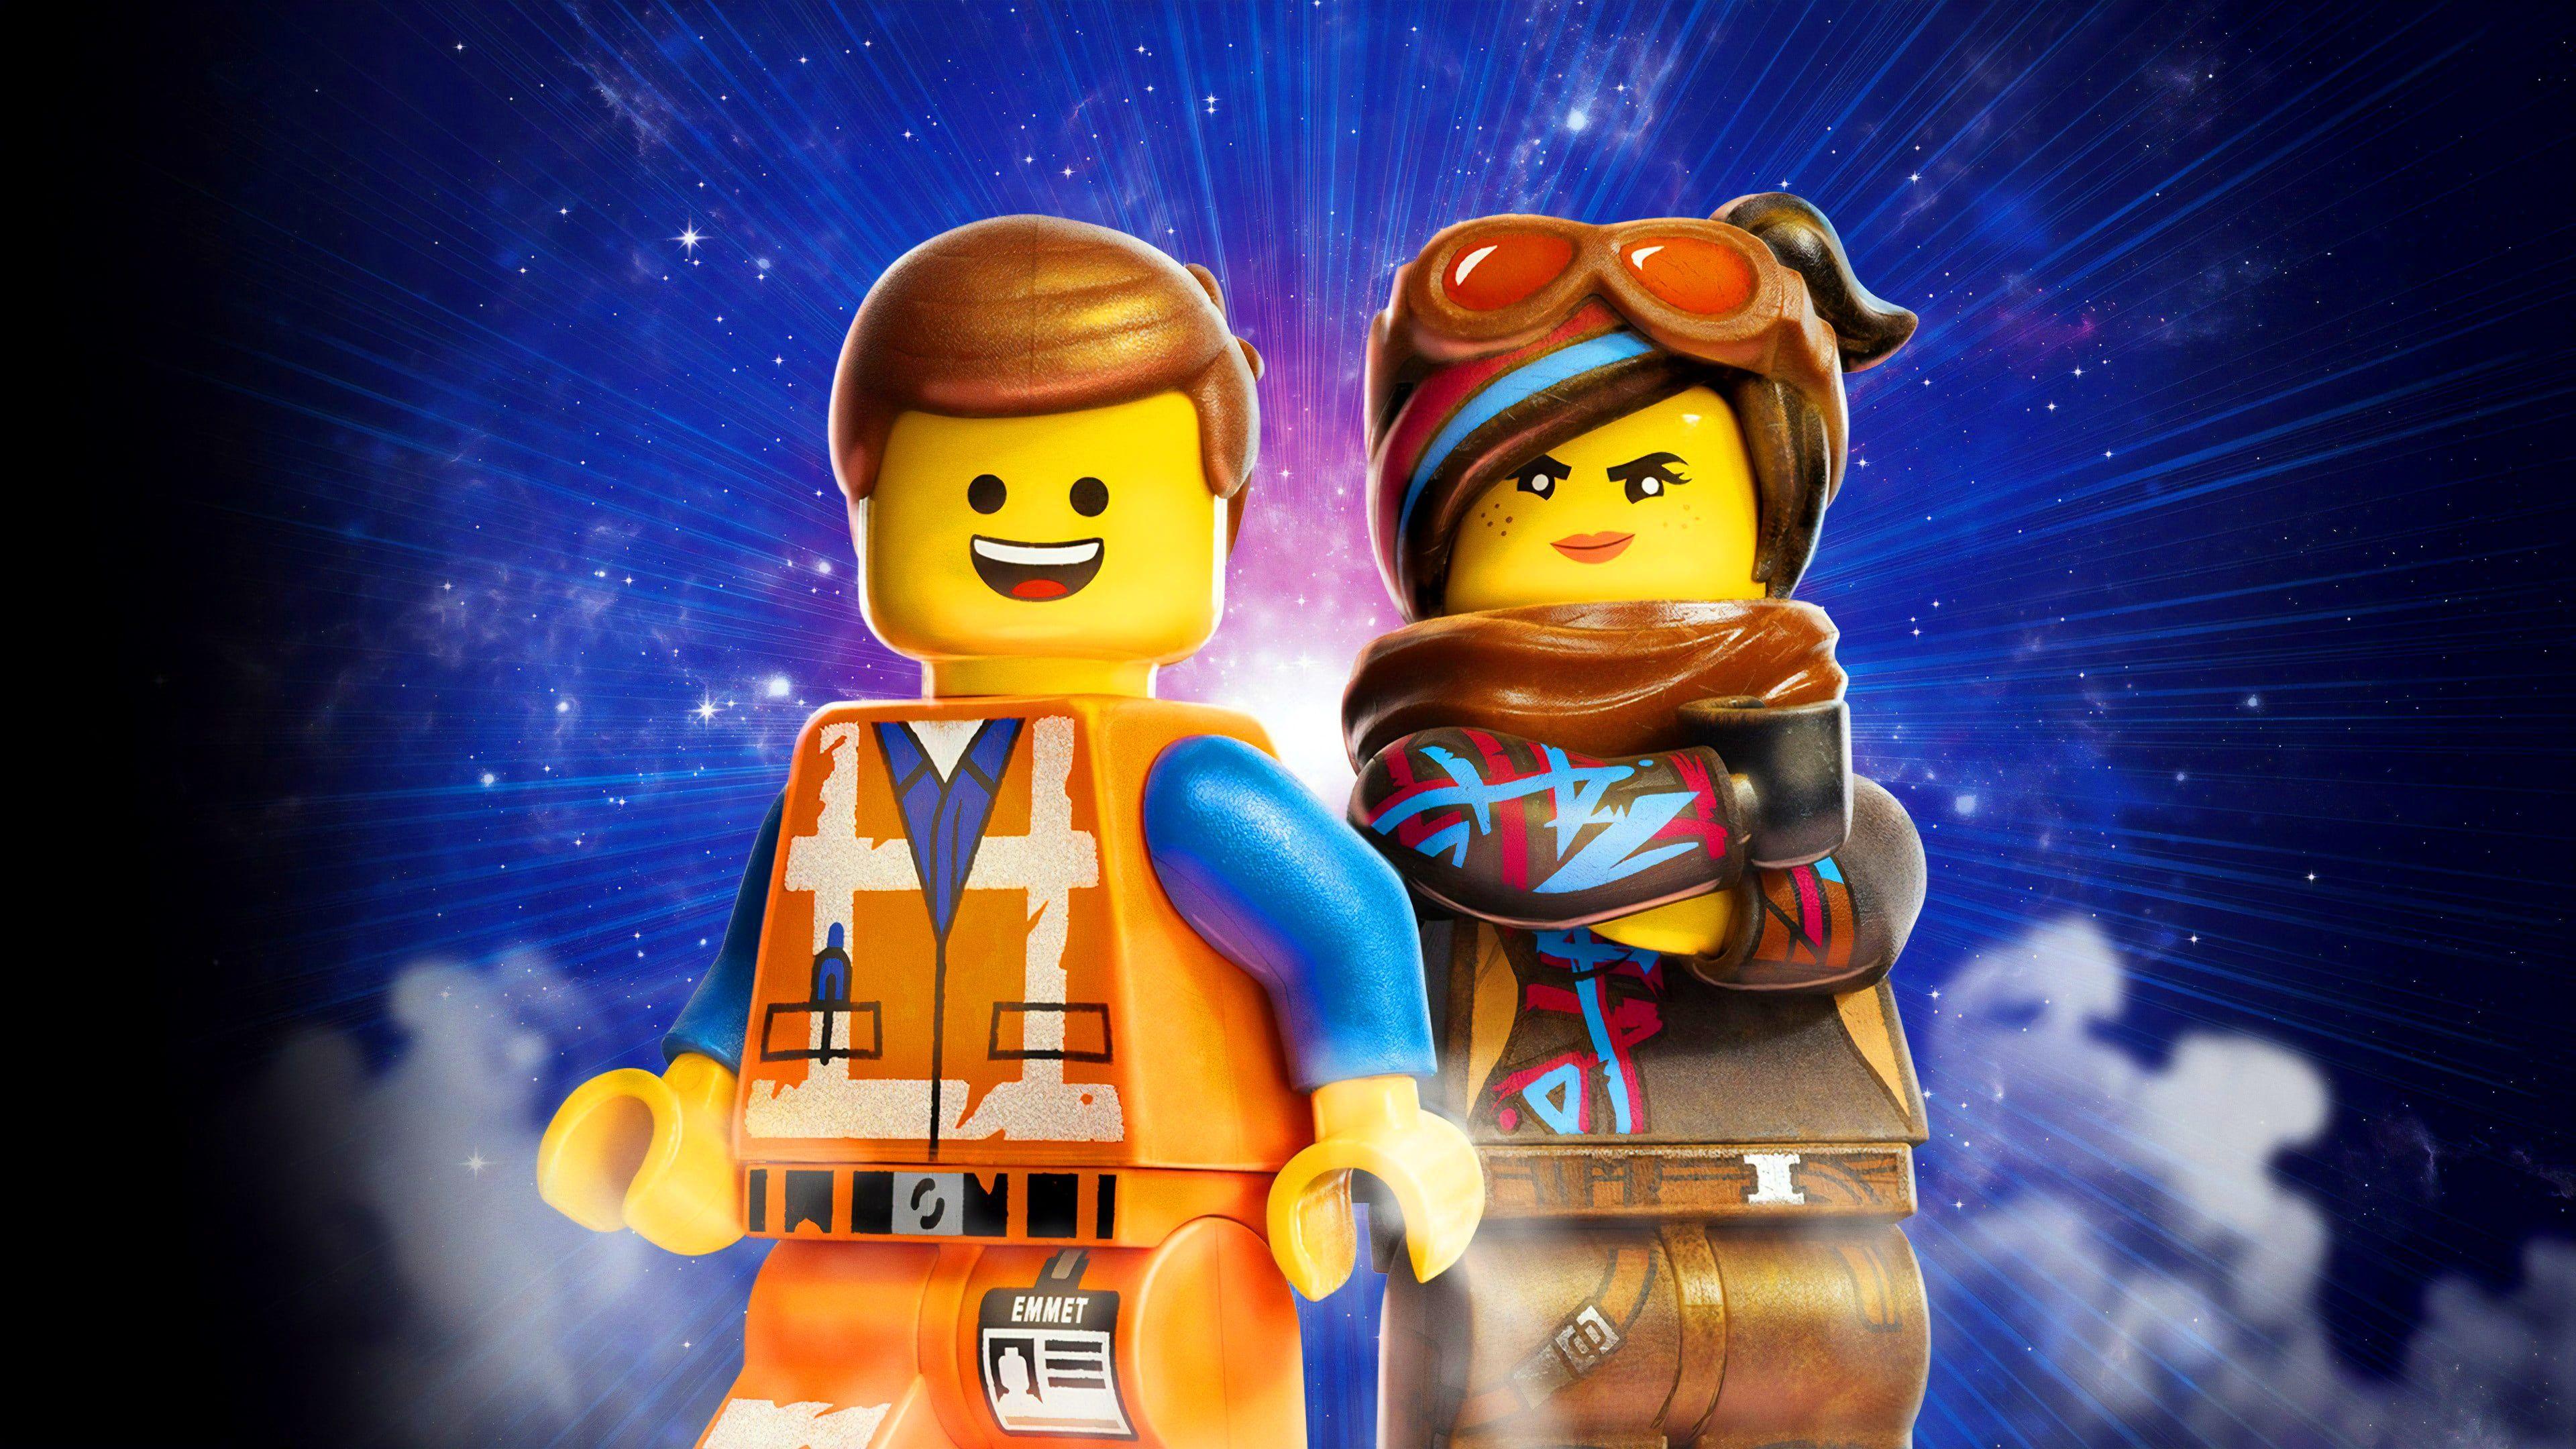 A Lego Kaland 2 2019 Online Teljes Film Filmek Magyarul Letoltes Hd Mar 5 Eve Fantasztikus Minden De Egy Uj Fenyeget Lego Movie Lego Movie 2 Movie Wallpapers